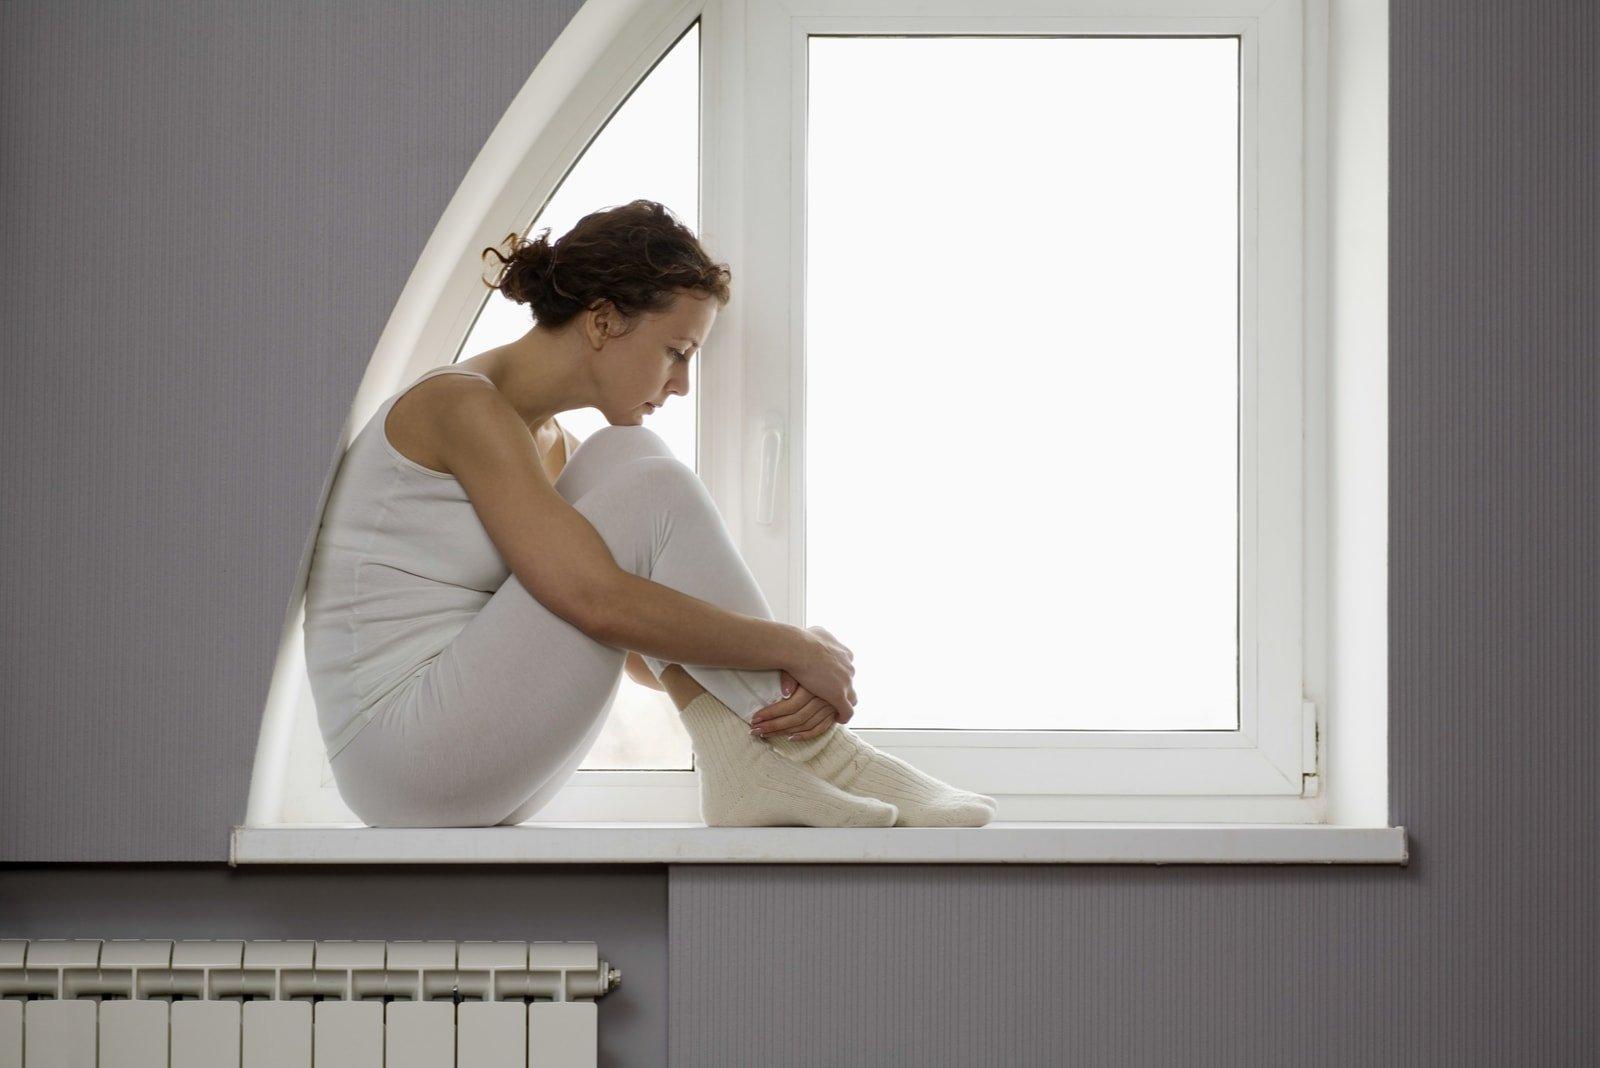 sad woman sitting on window sill